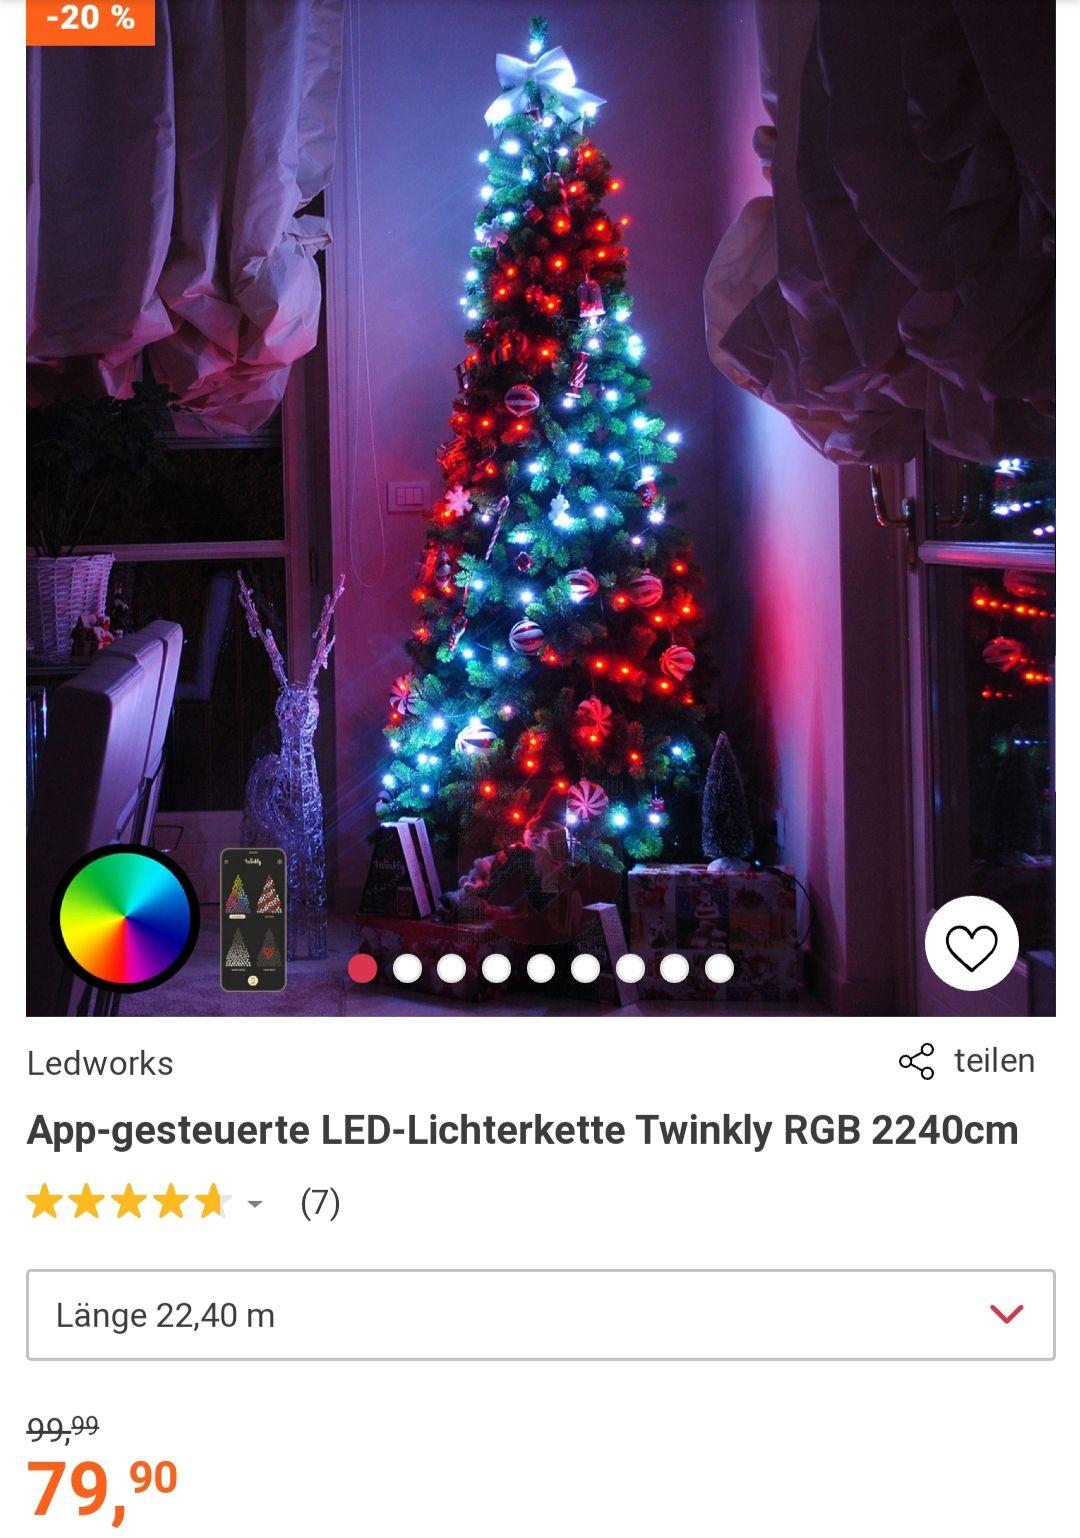 App-gesteuerte LED-Lichterkette Twinkly RGB 1040cm von Ledworks